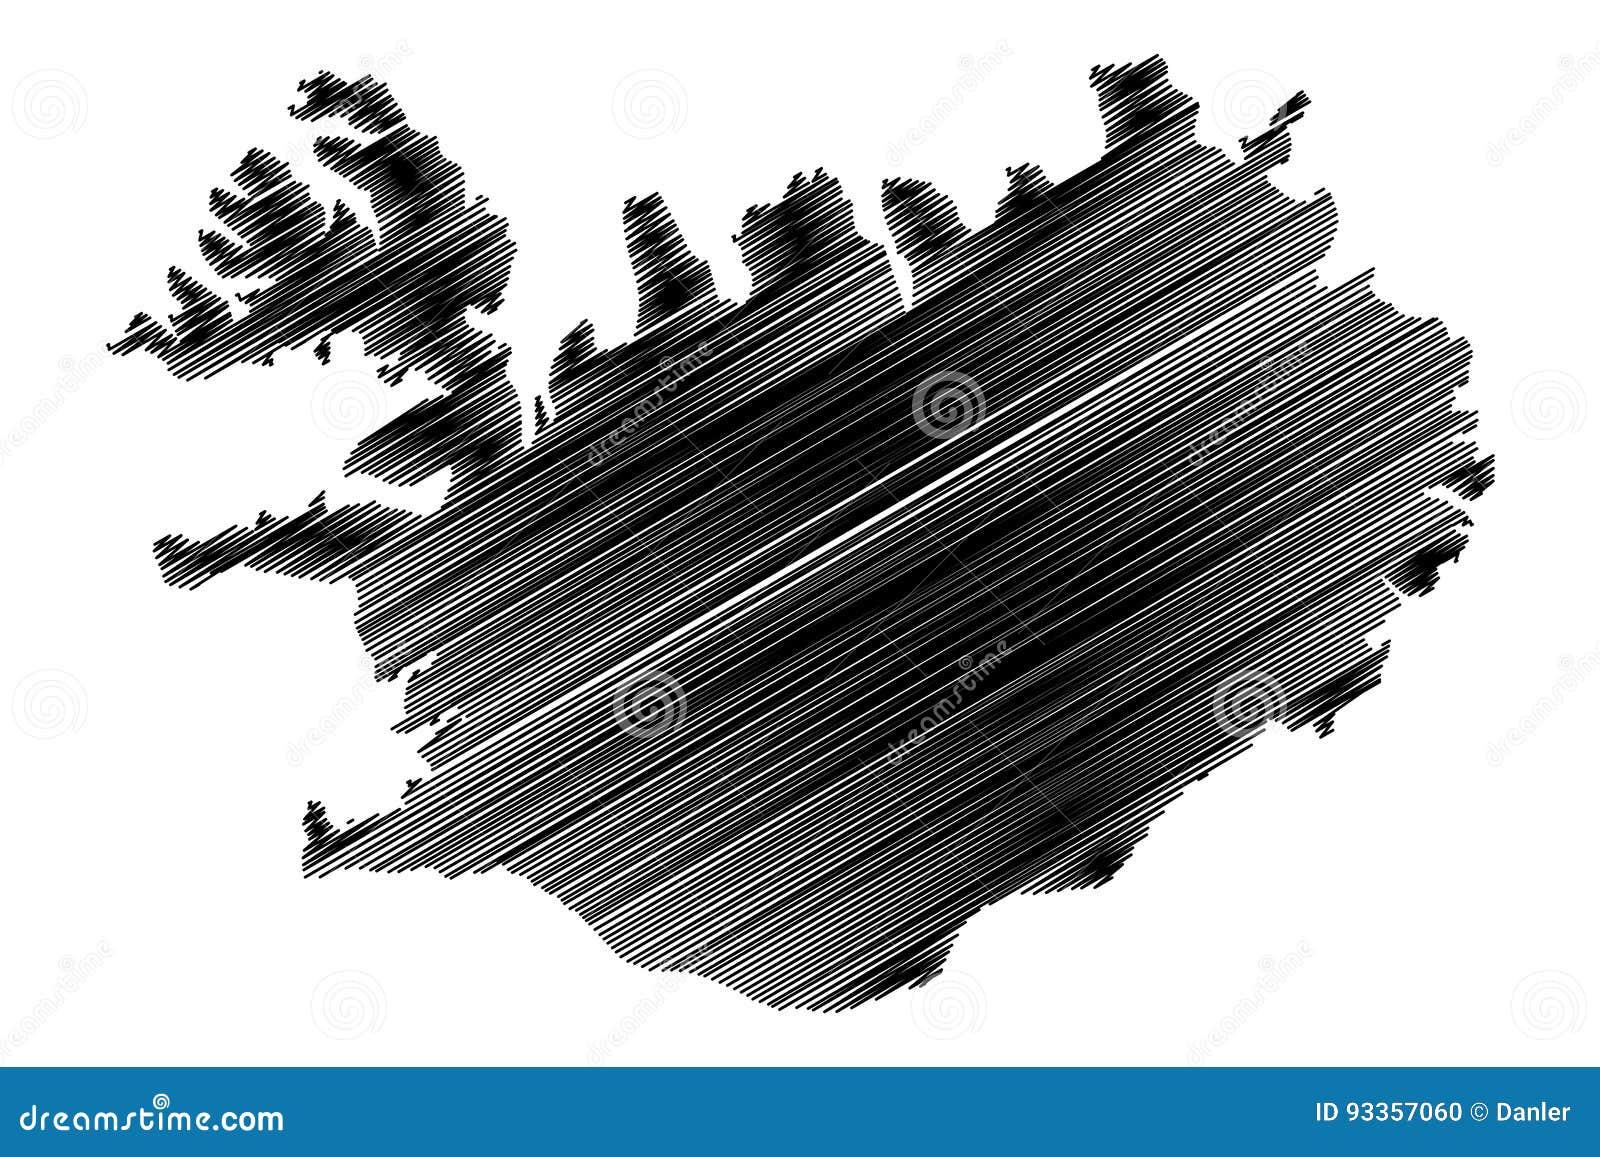 Iceland map vector stock vector. Illustration of ocean - 93357060